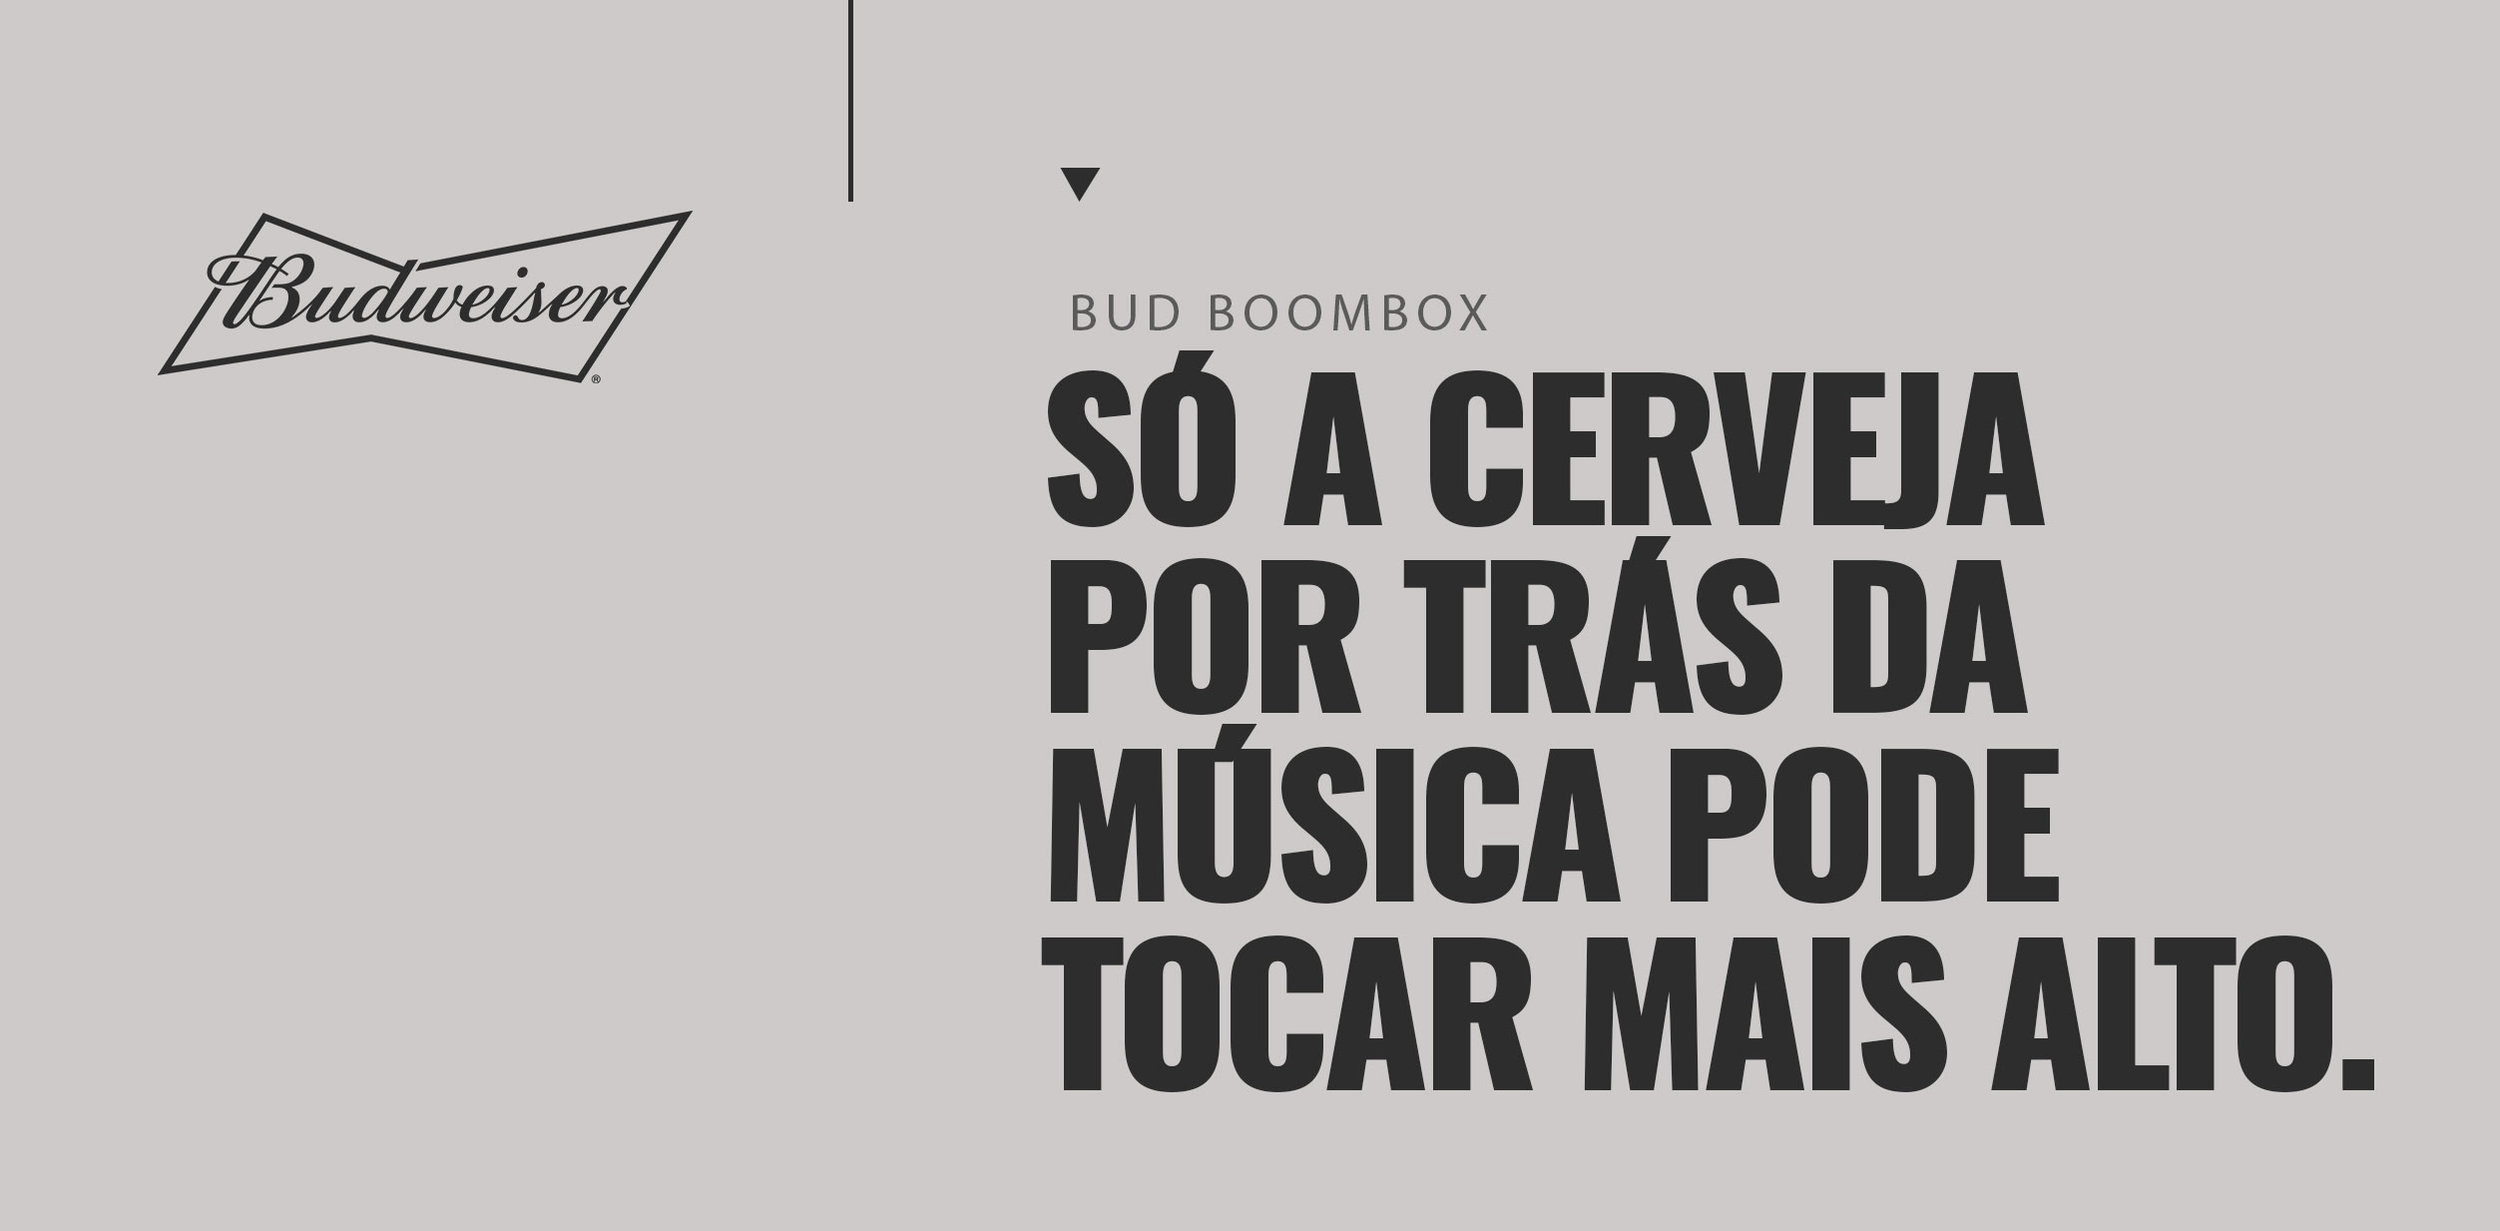 Texto_Budweiser.jpg